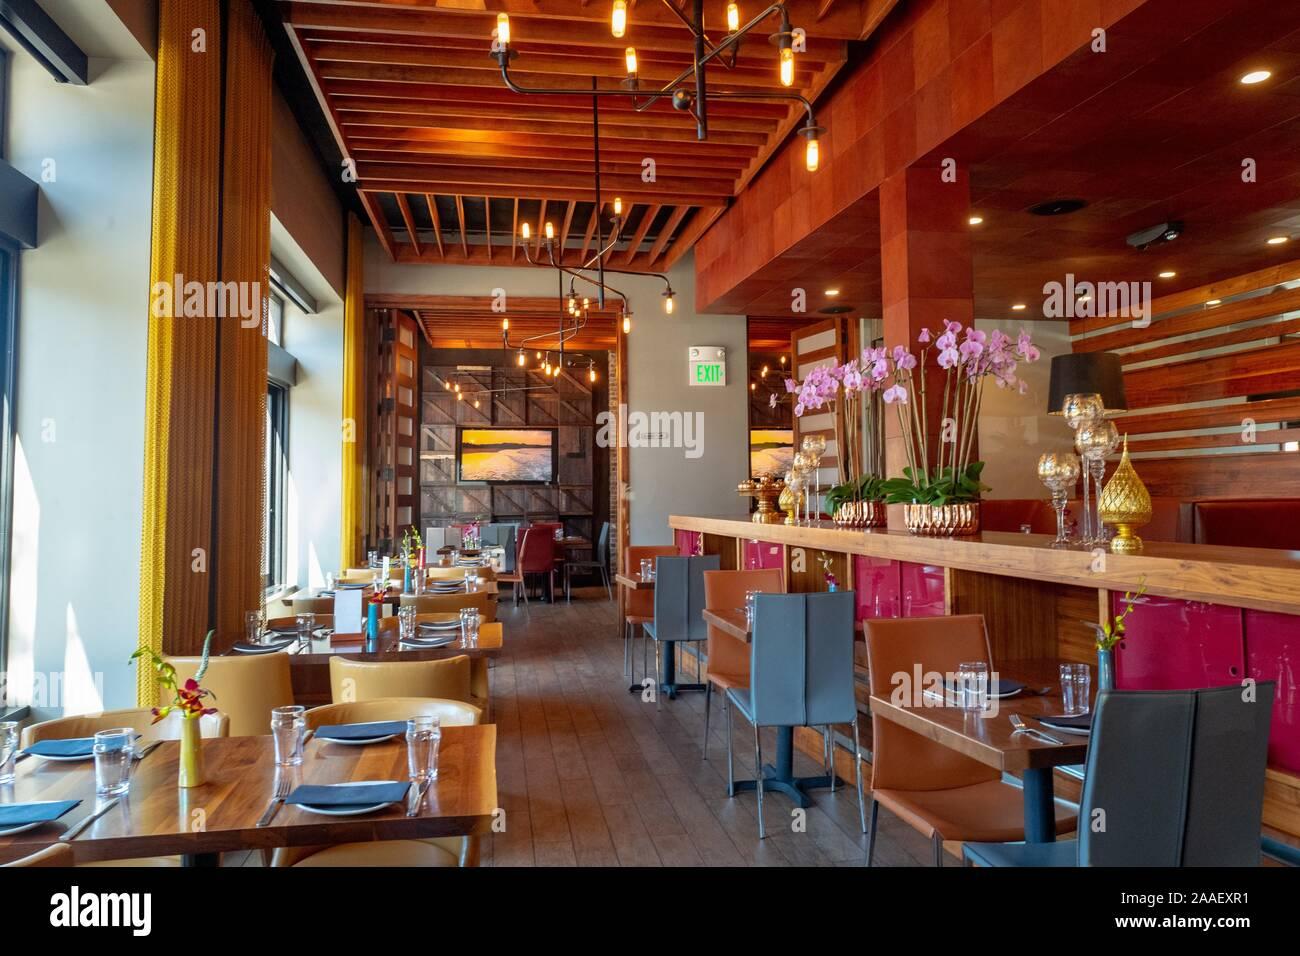 Interior of Torsap Thai Kitchen upscale Thai cuisine restaurant in Walnut Creek, California, July 29, 2019. () Stock Photo